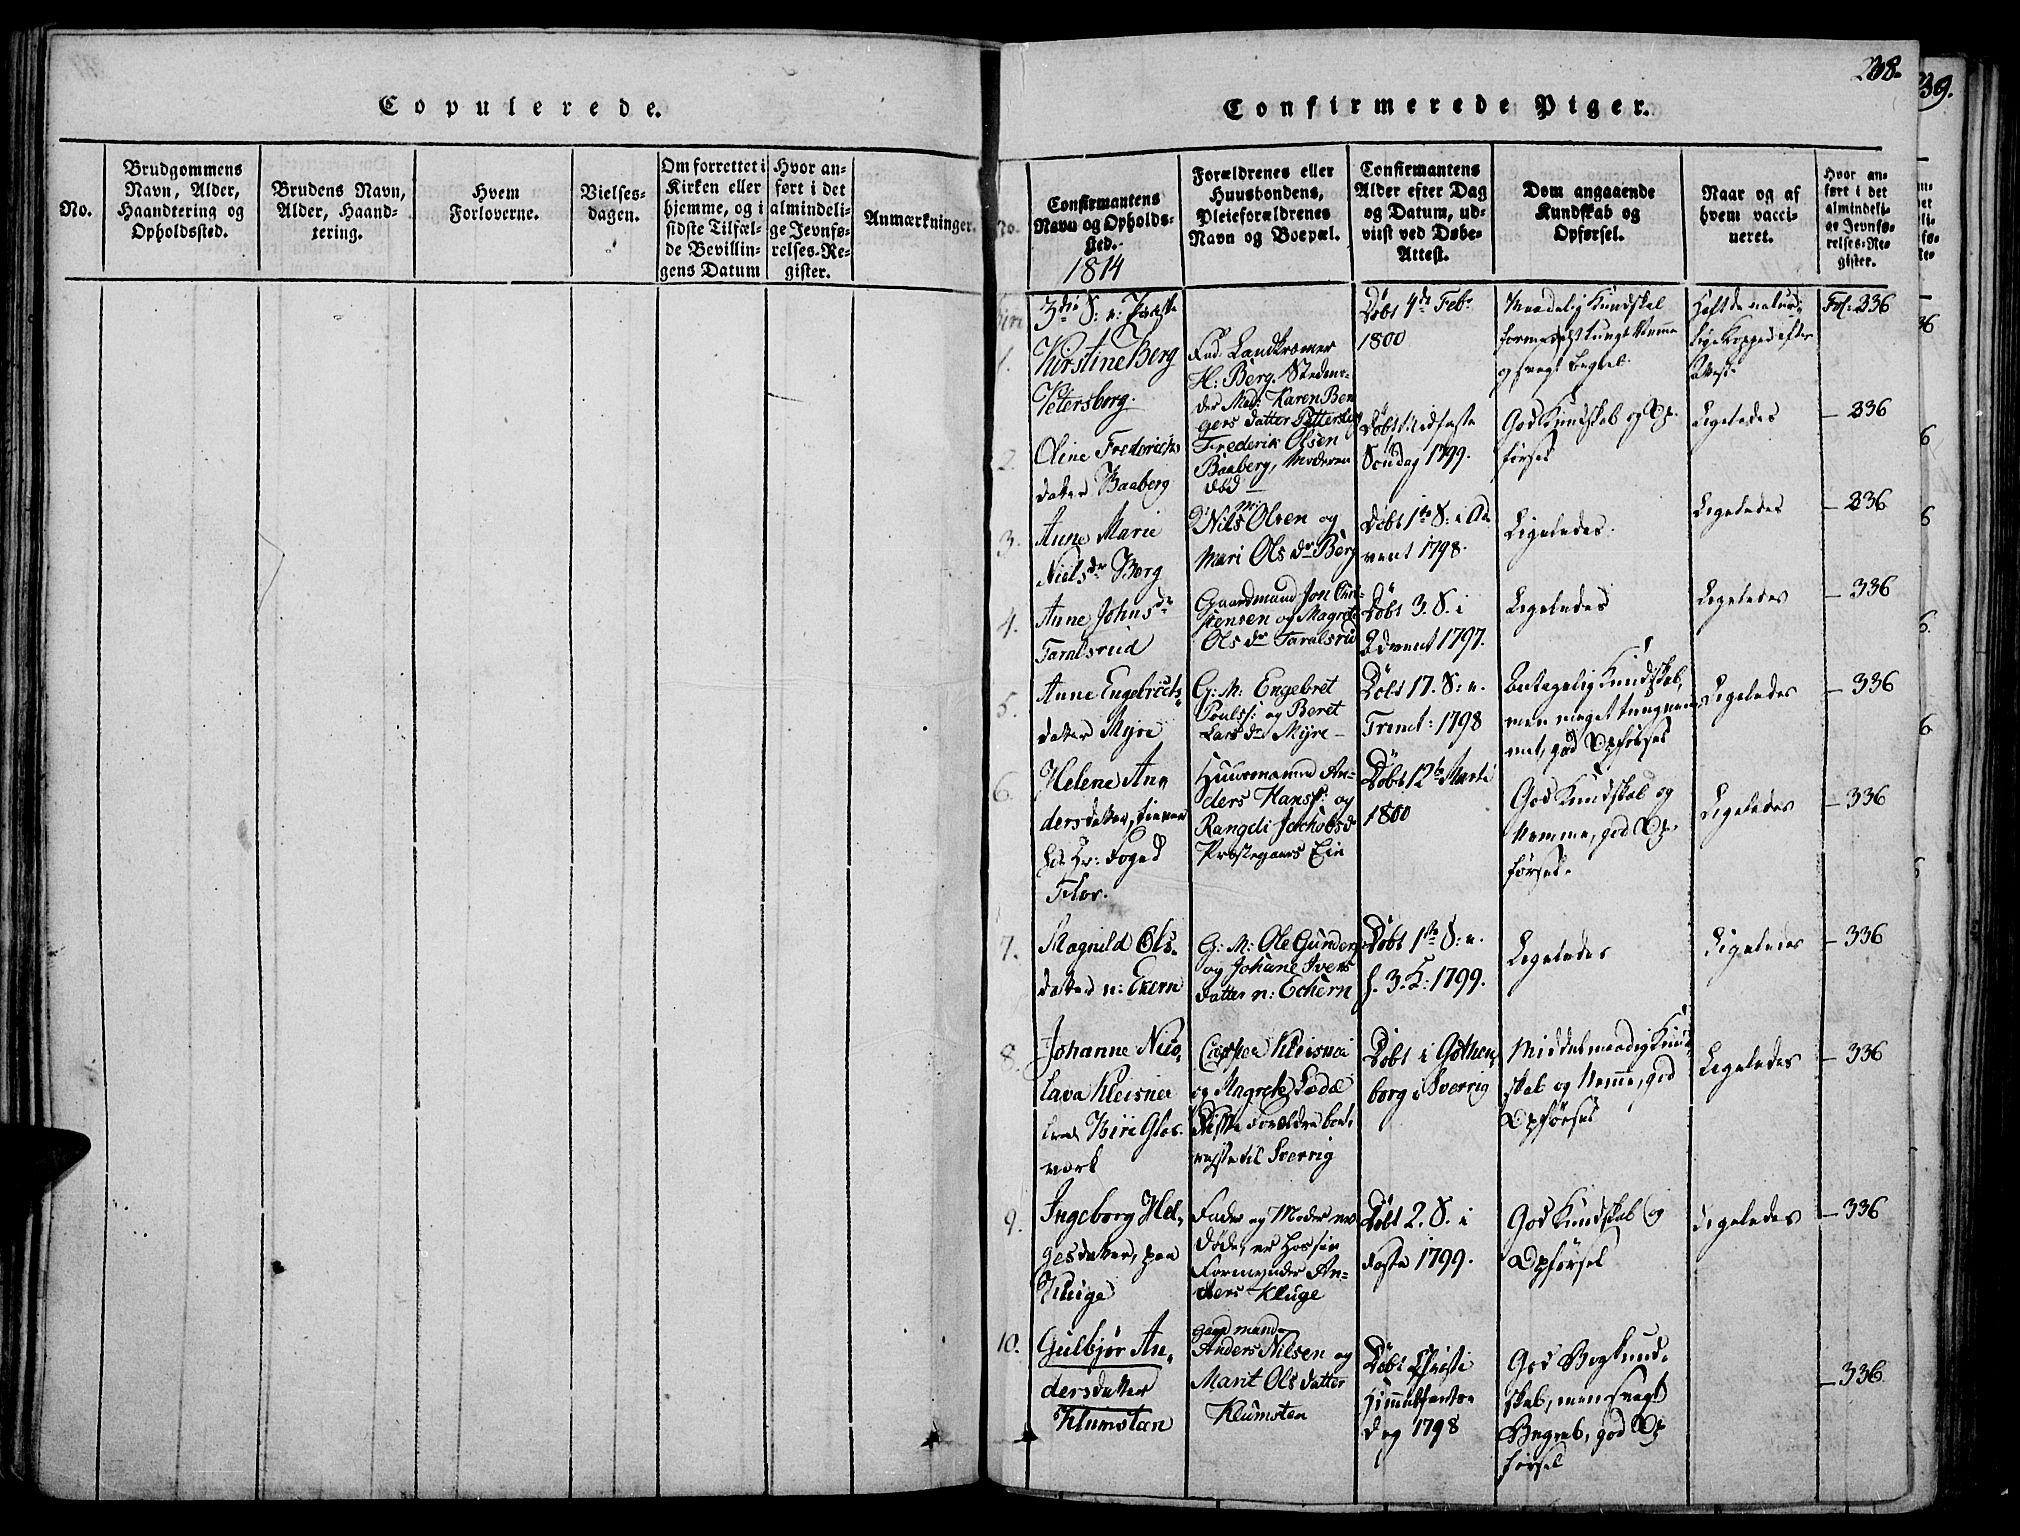 SAH, Biri prestekontor, Ministerialbok nr. 3, 1814-1828, s. 238